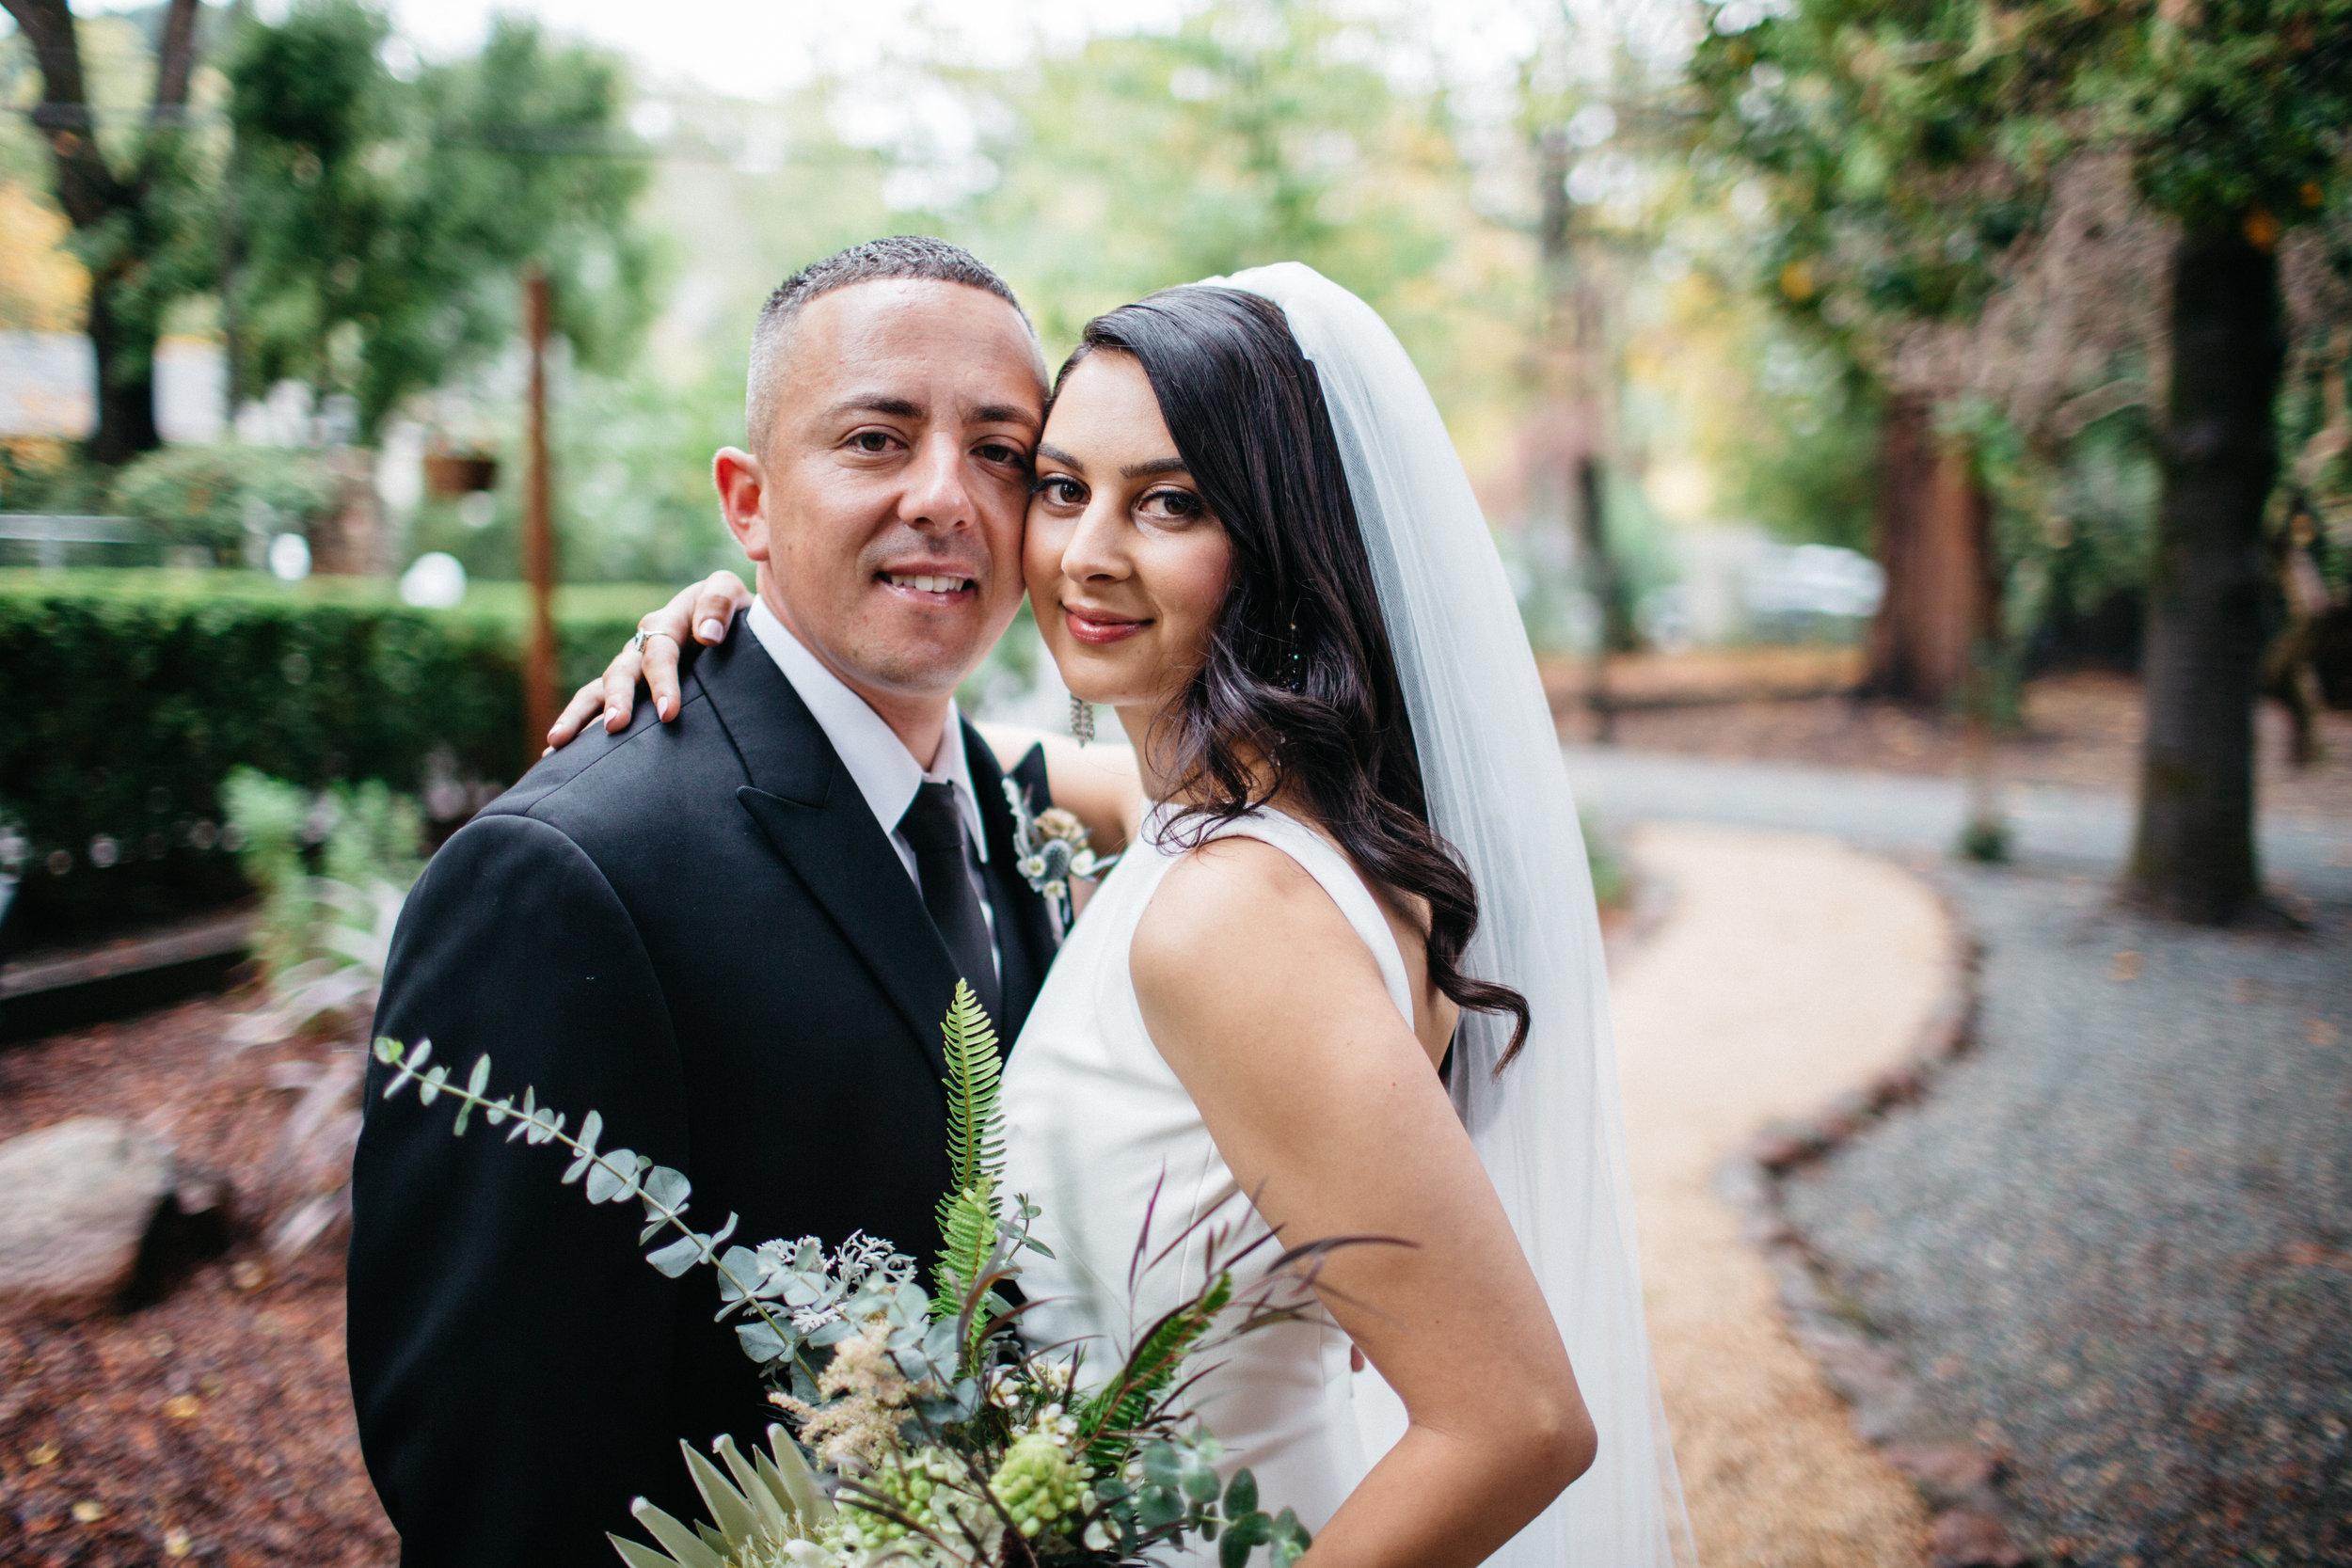 sweet_and_crafty_jocelyn_domingo_wedding_portfolio_032.jpg